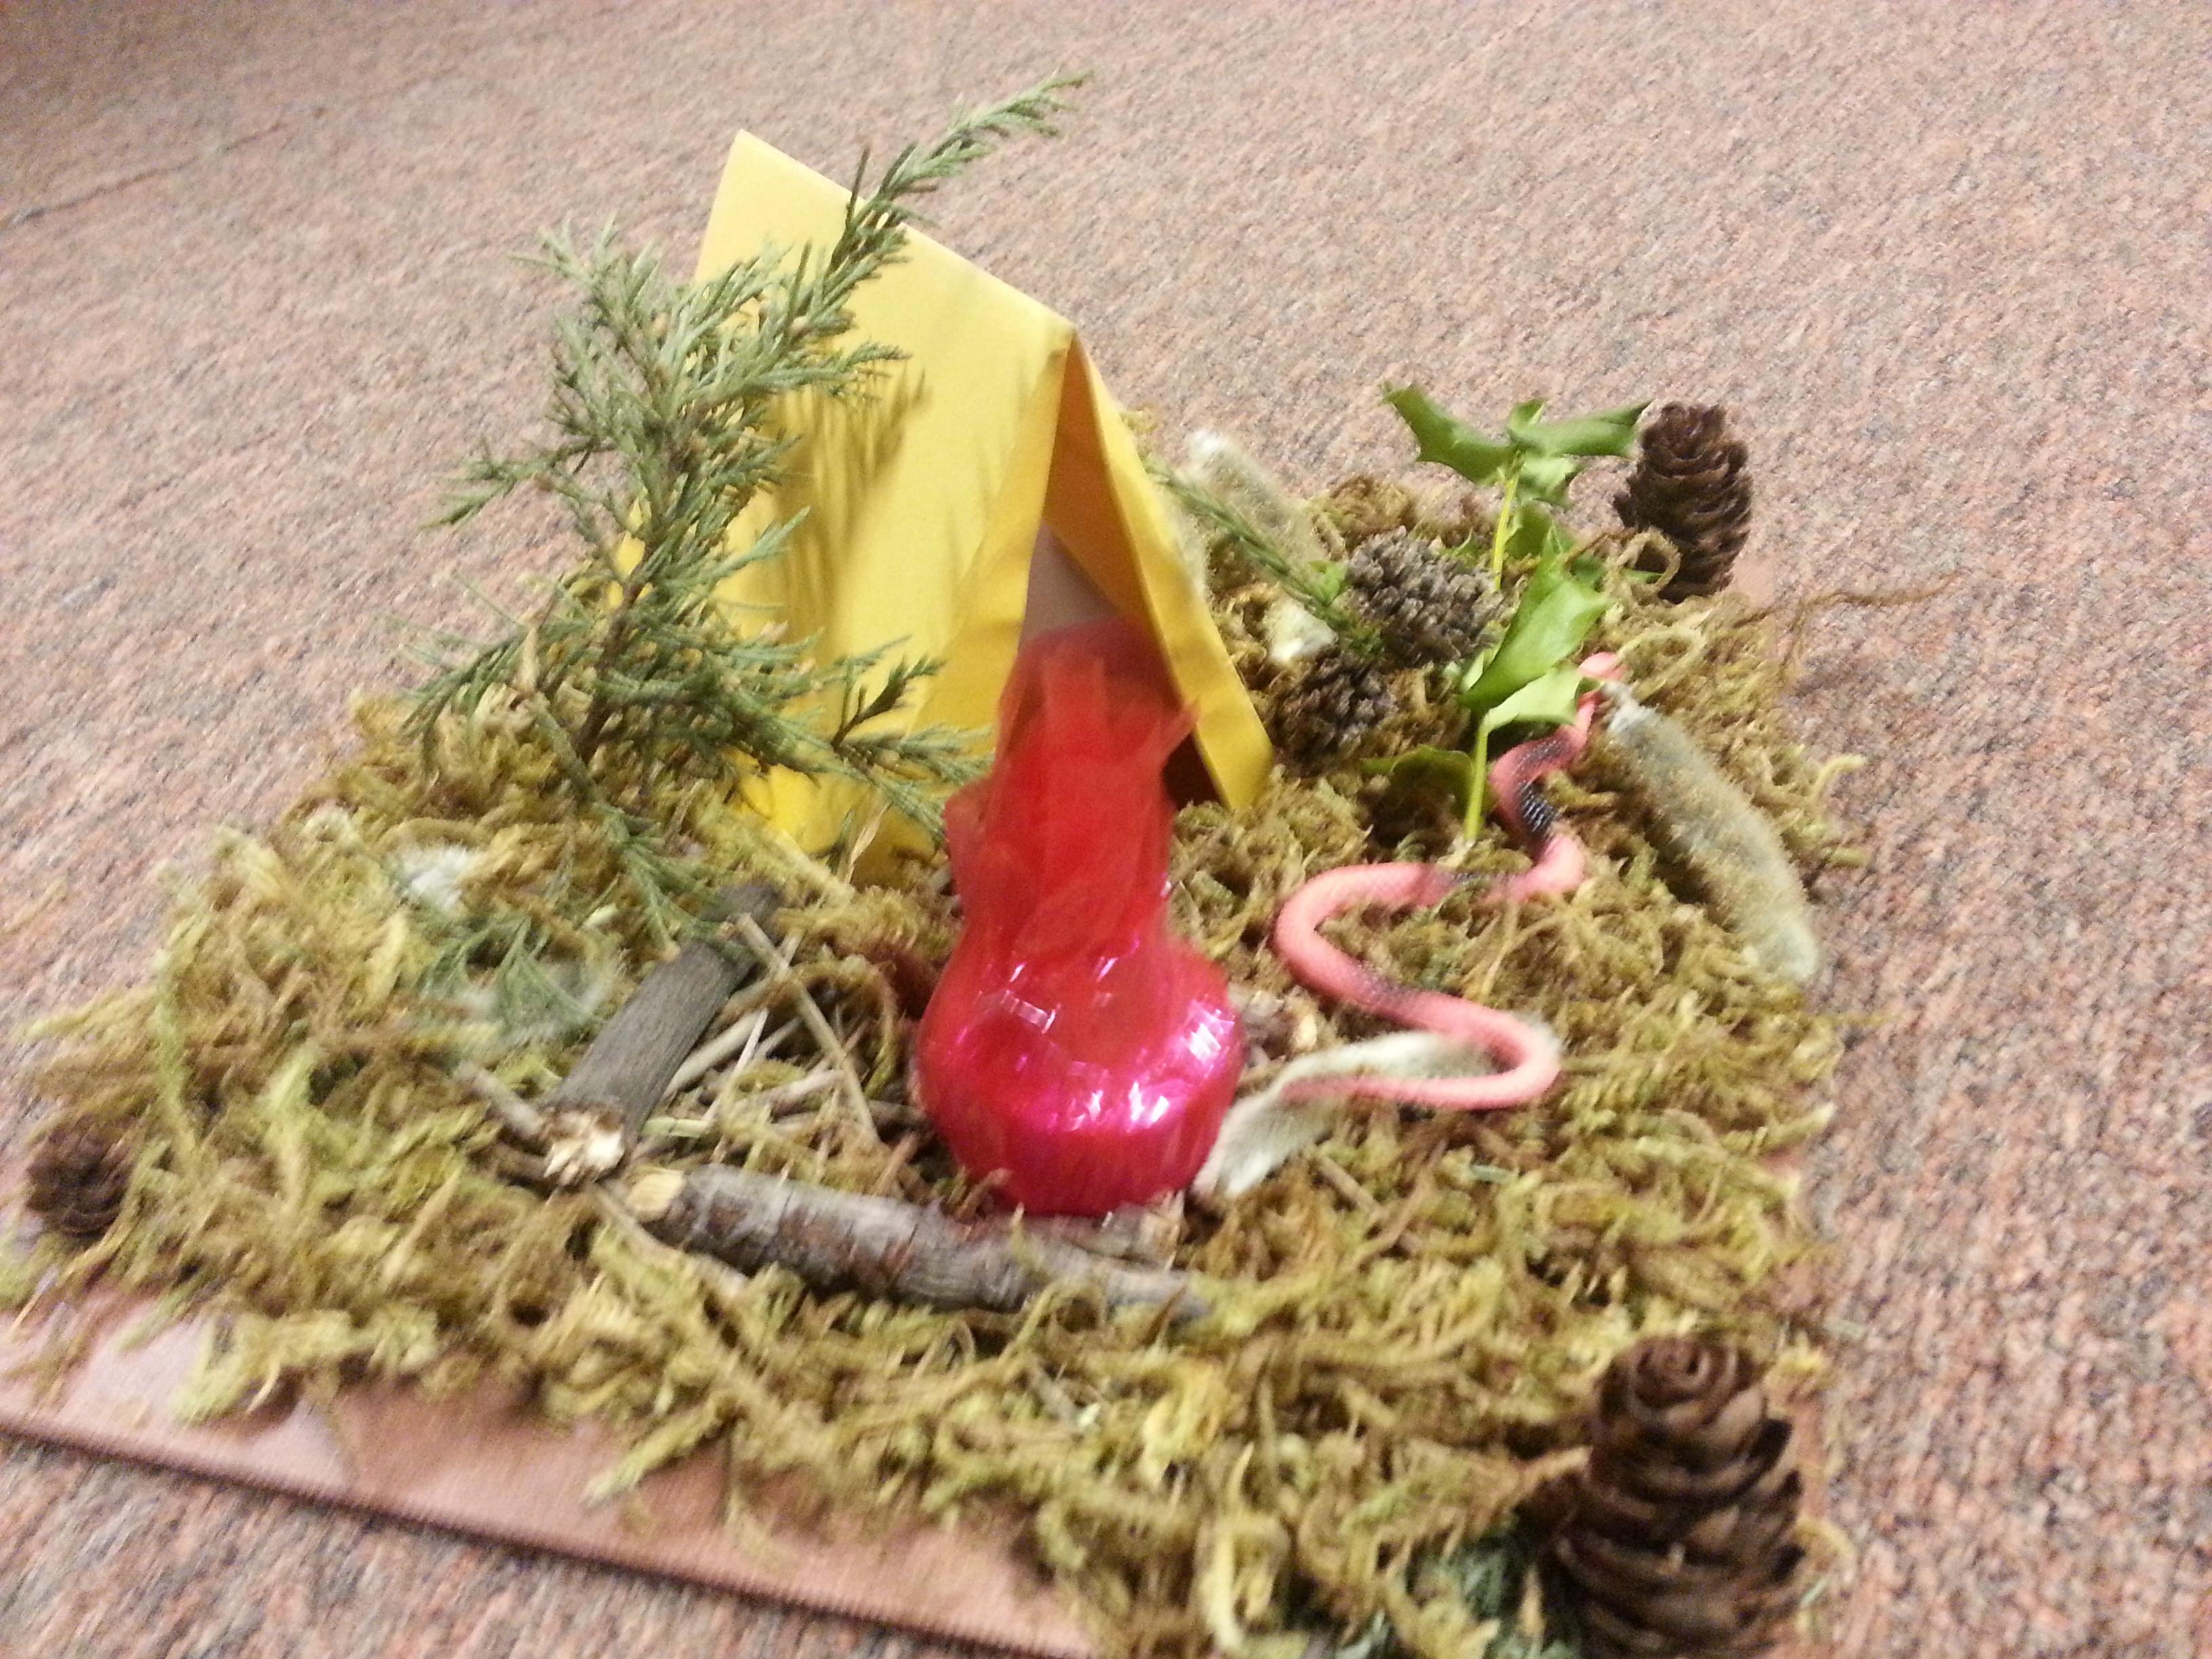 snake habitat diorama campground diy